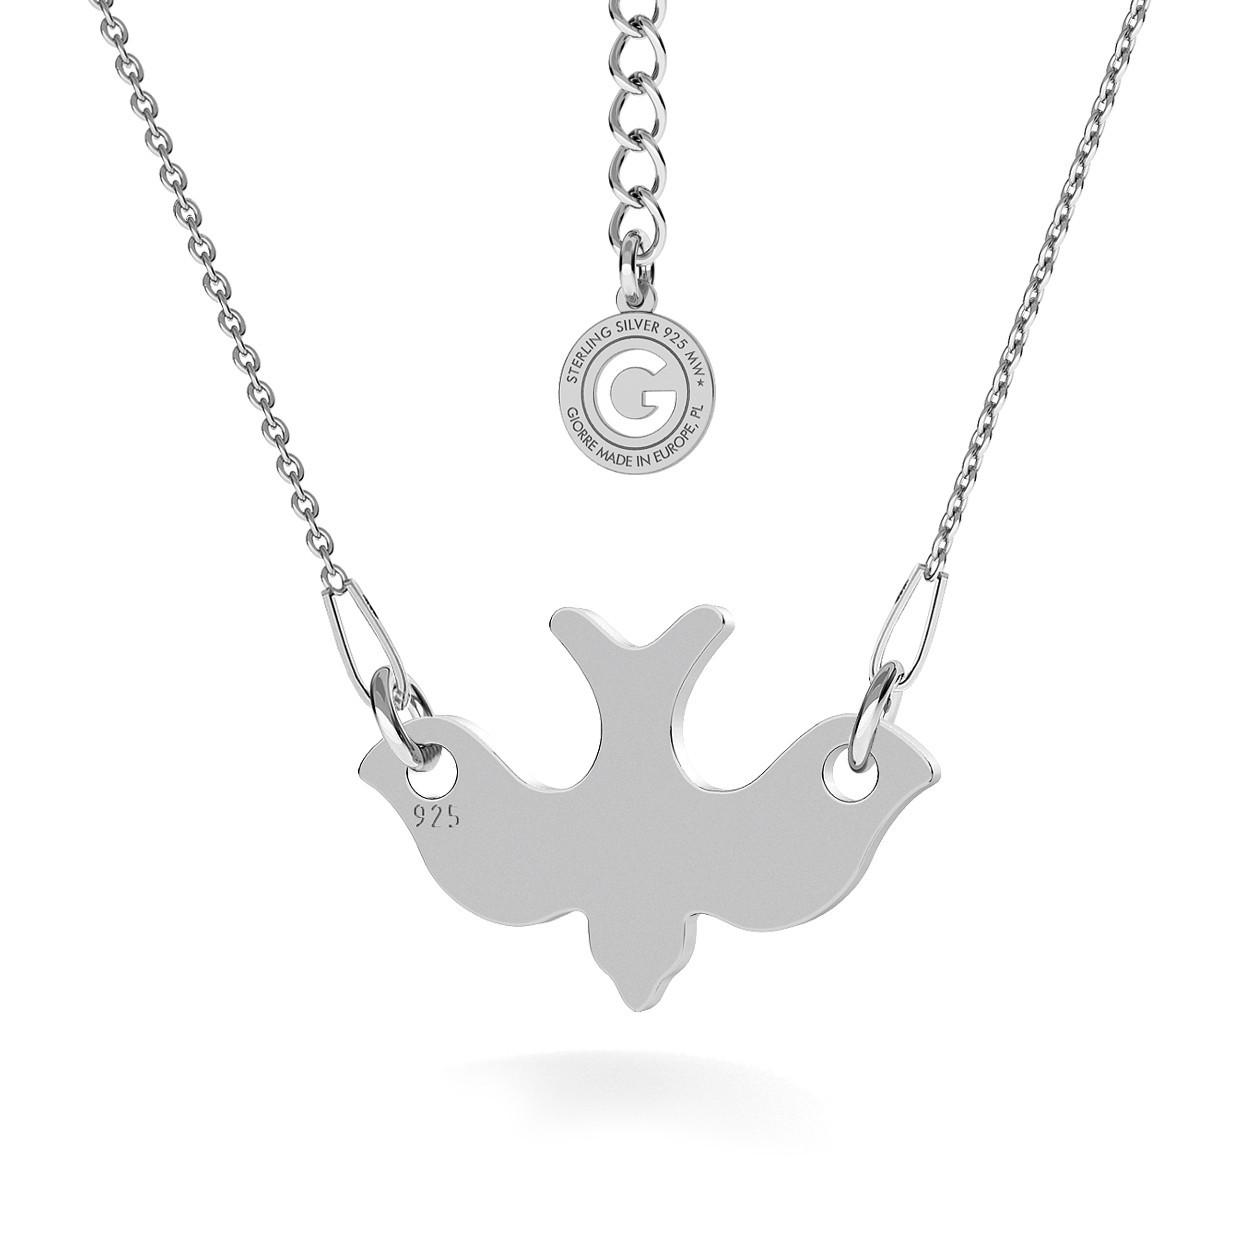 Srebrny naszyjnik celebrytka jaskółka, lecący ptak 925